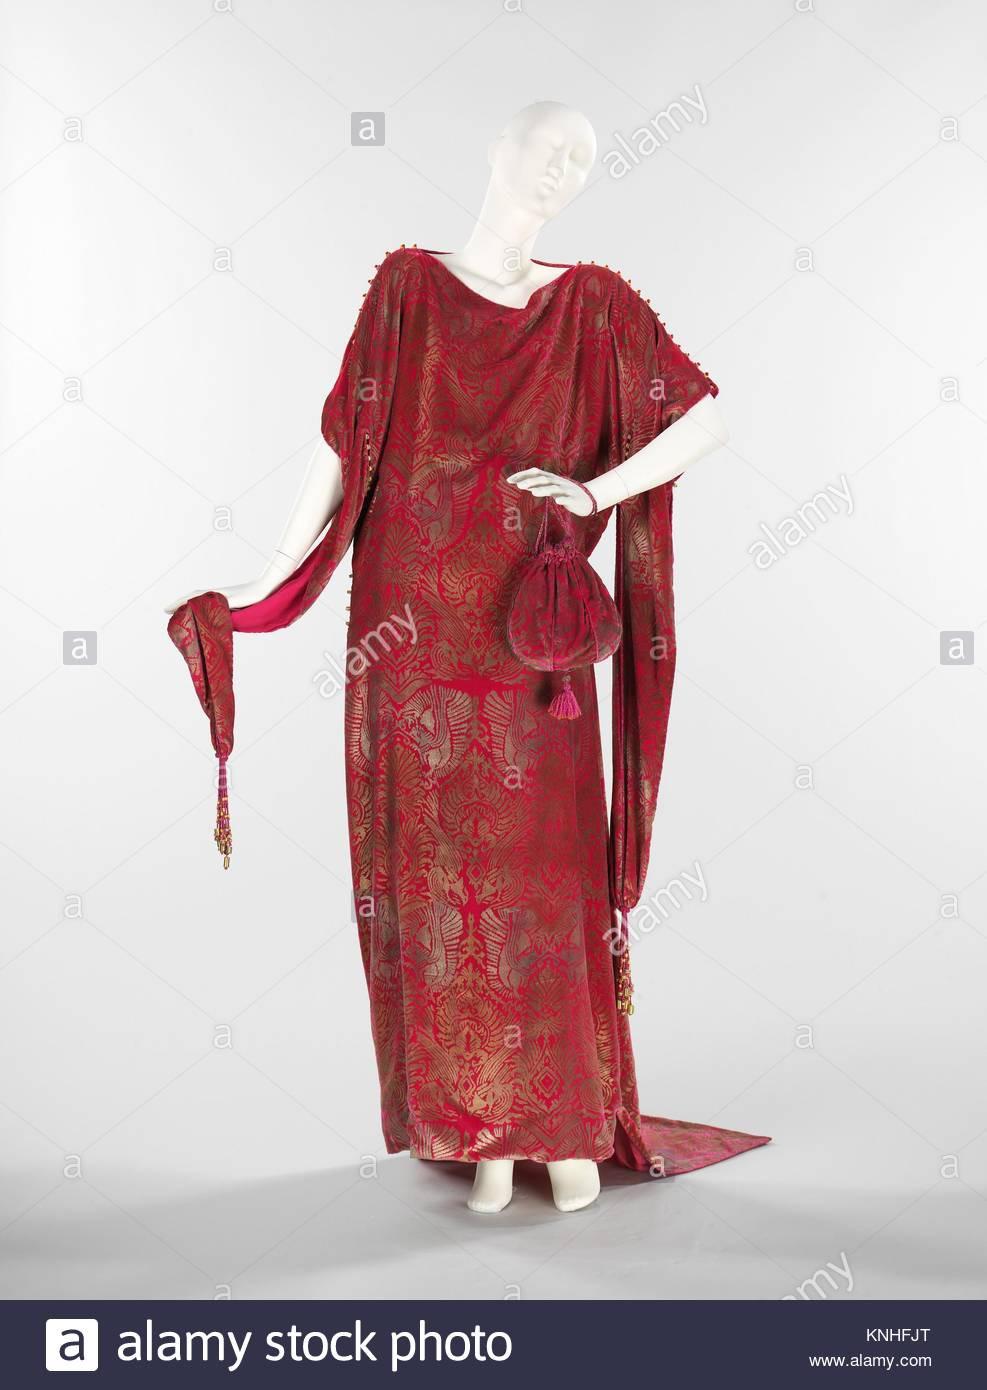 Elegant Abendkleid Italienisch Stylish17 Cool Abendkleid Italienisch Galerie